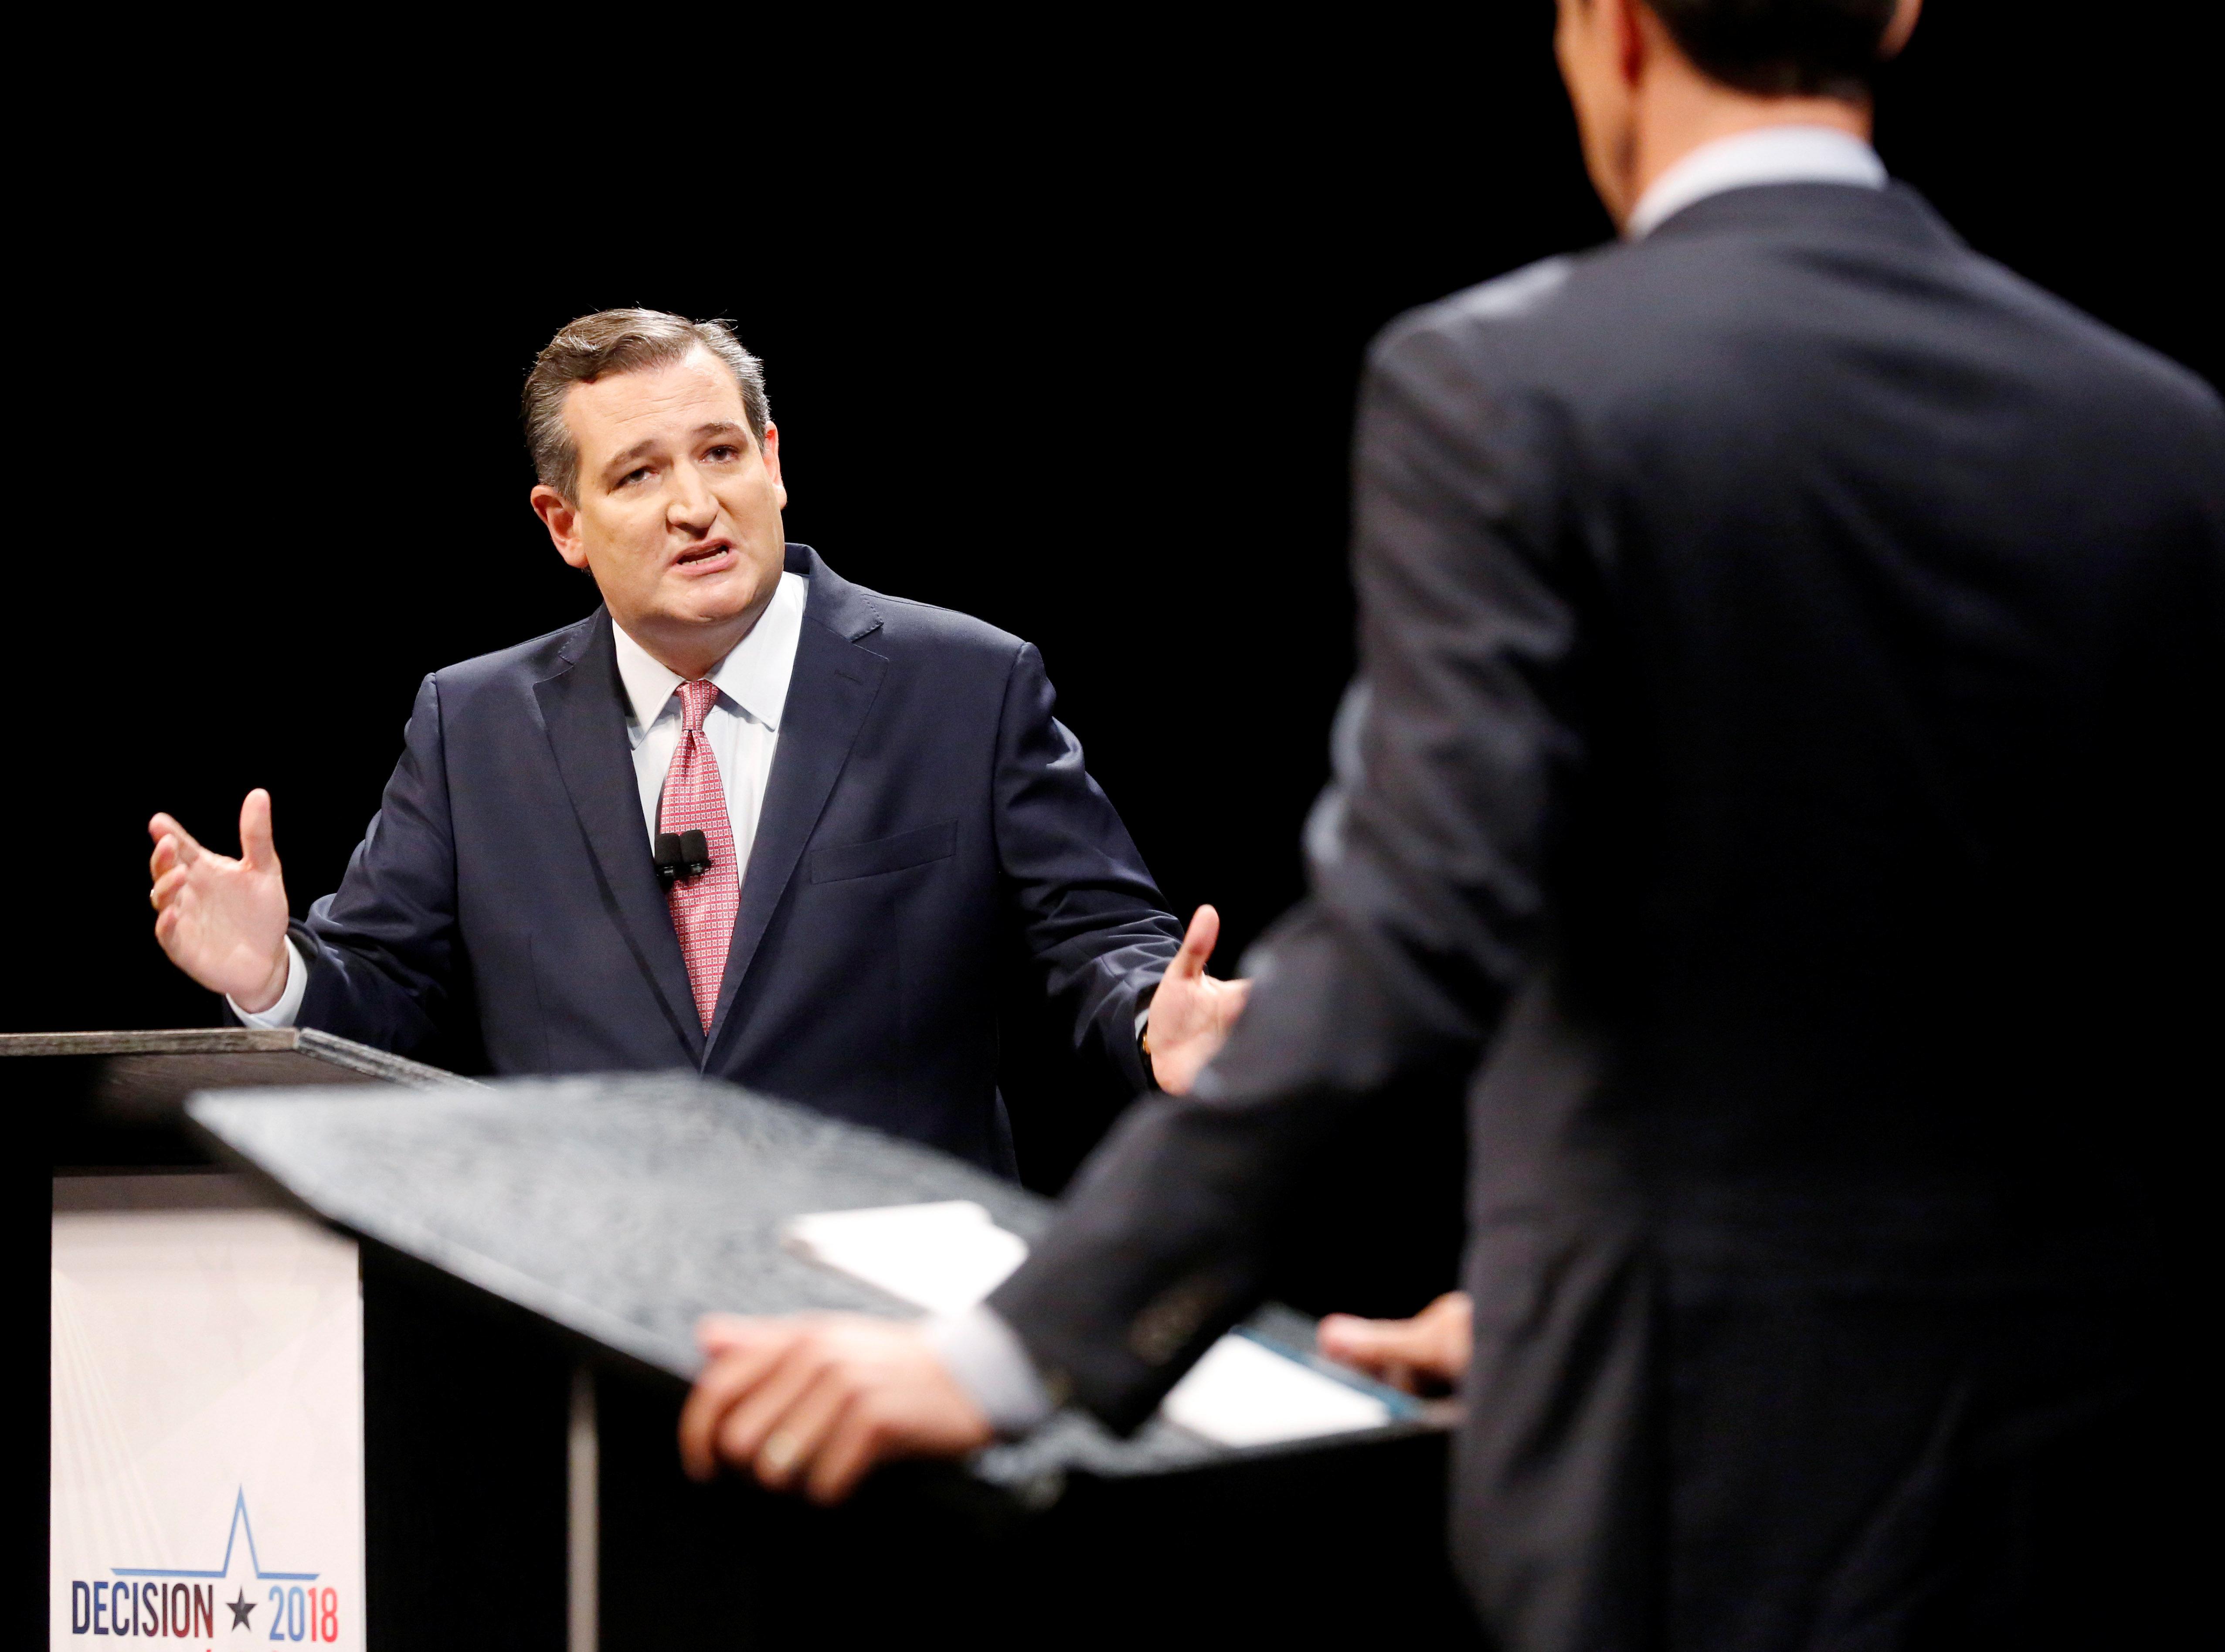 huffingtonpost.com - Sebastian Murdock - Is Ted Cruz Endorsing Beto O'Rourke In This Tweet Or Is His Racism Just Showing?